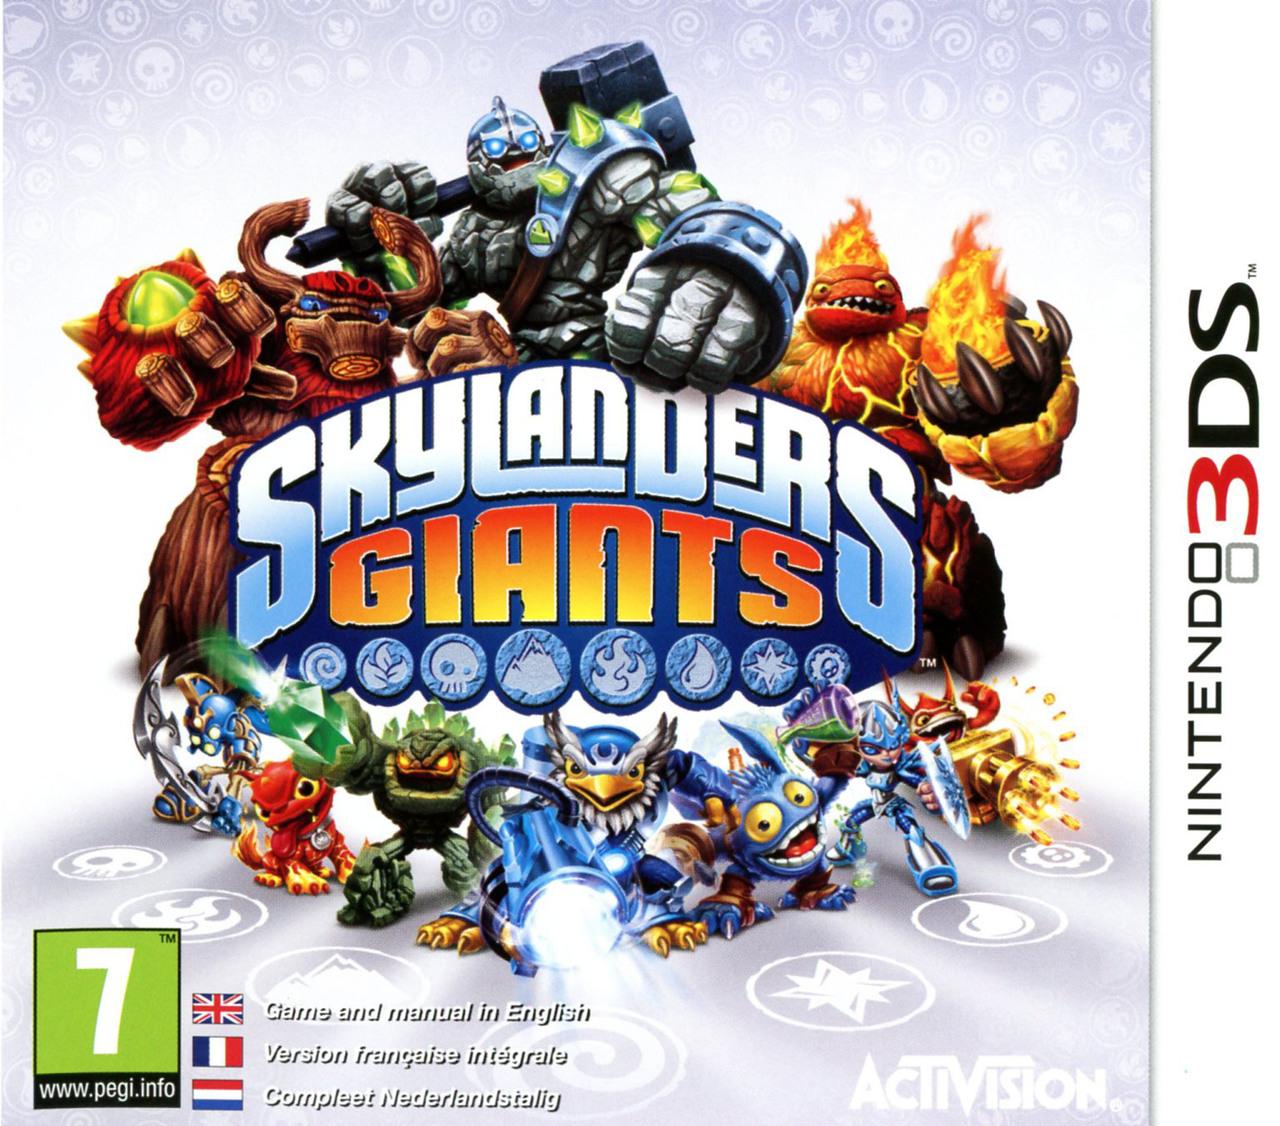 Jeux vid o skylanders giants 3ds d 39 occasion - Jeux gratuit skylanders ...